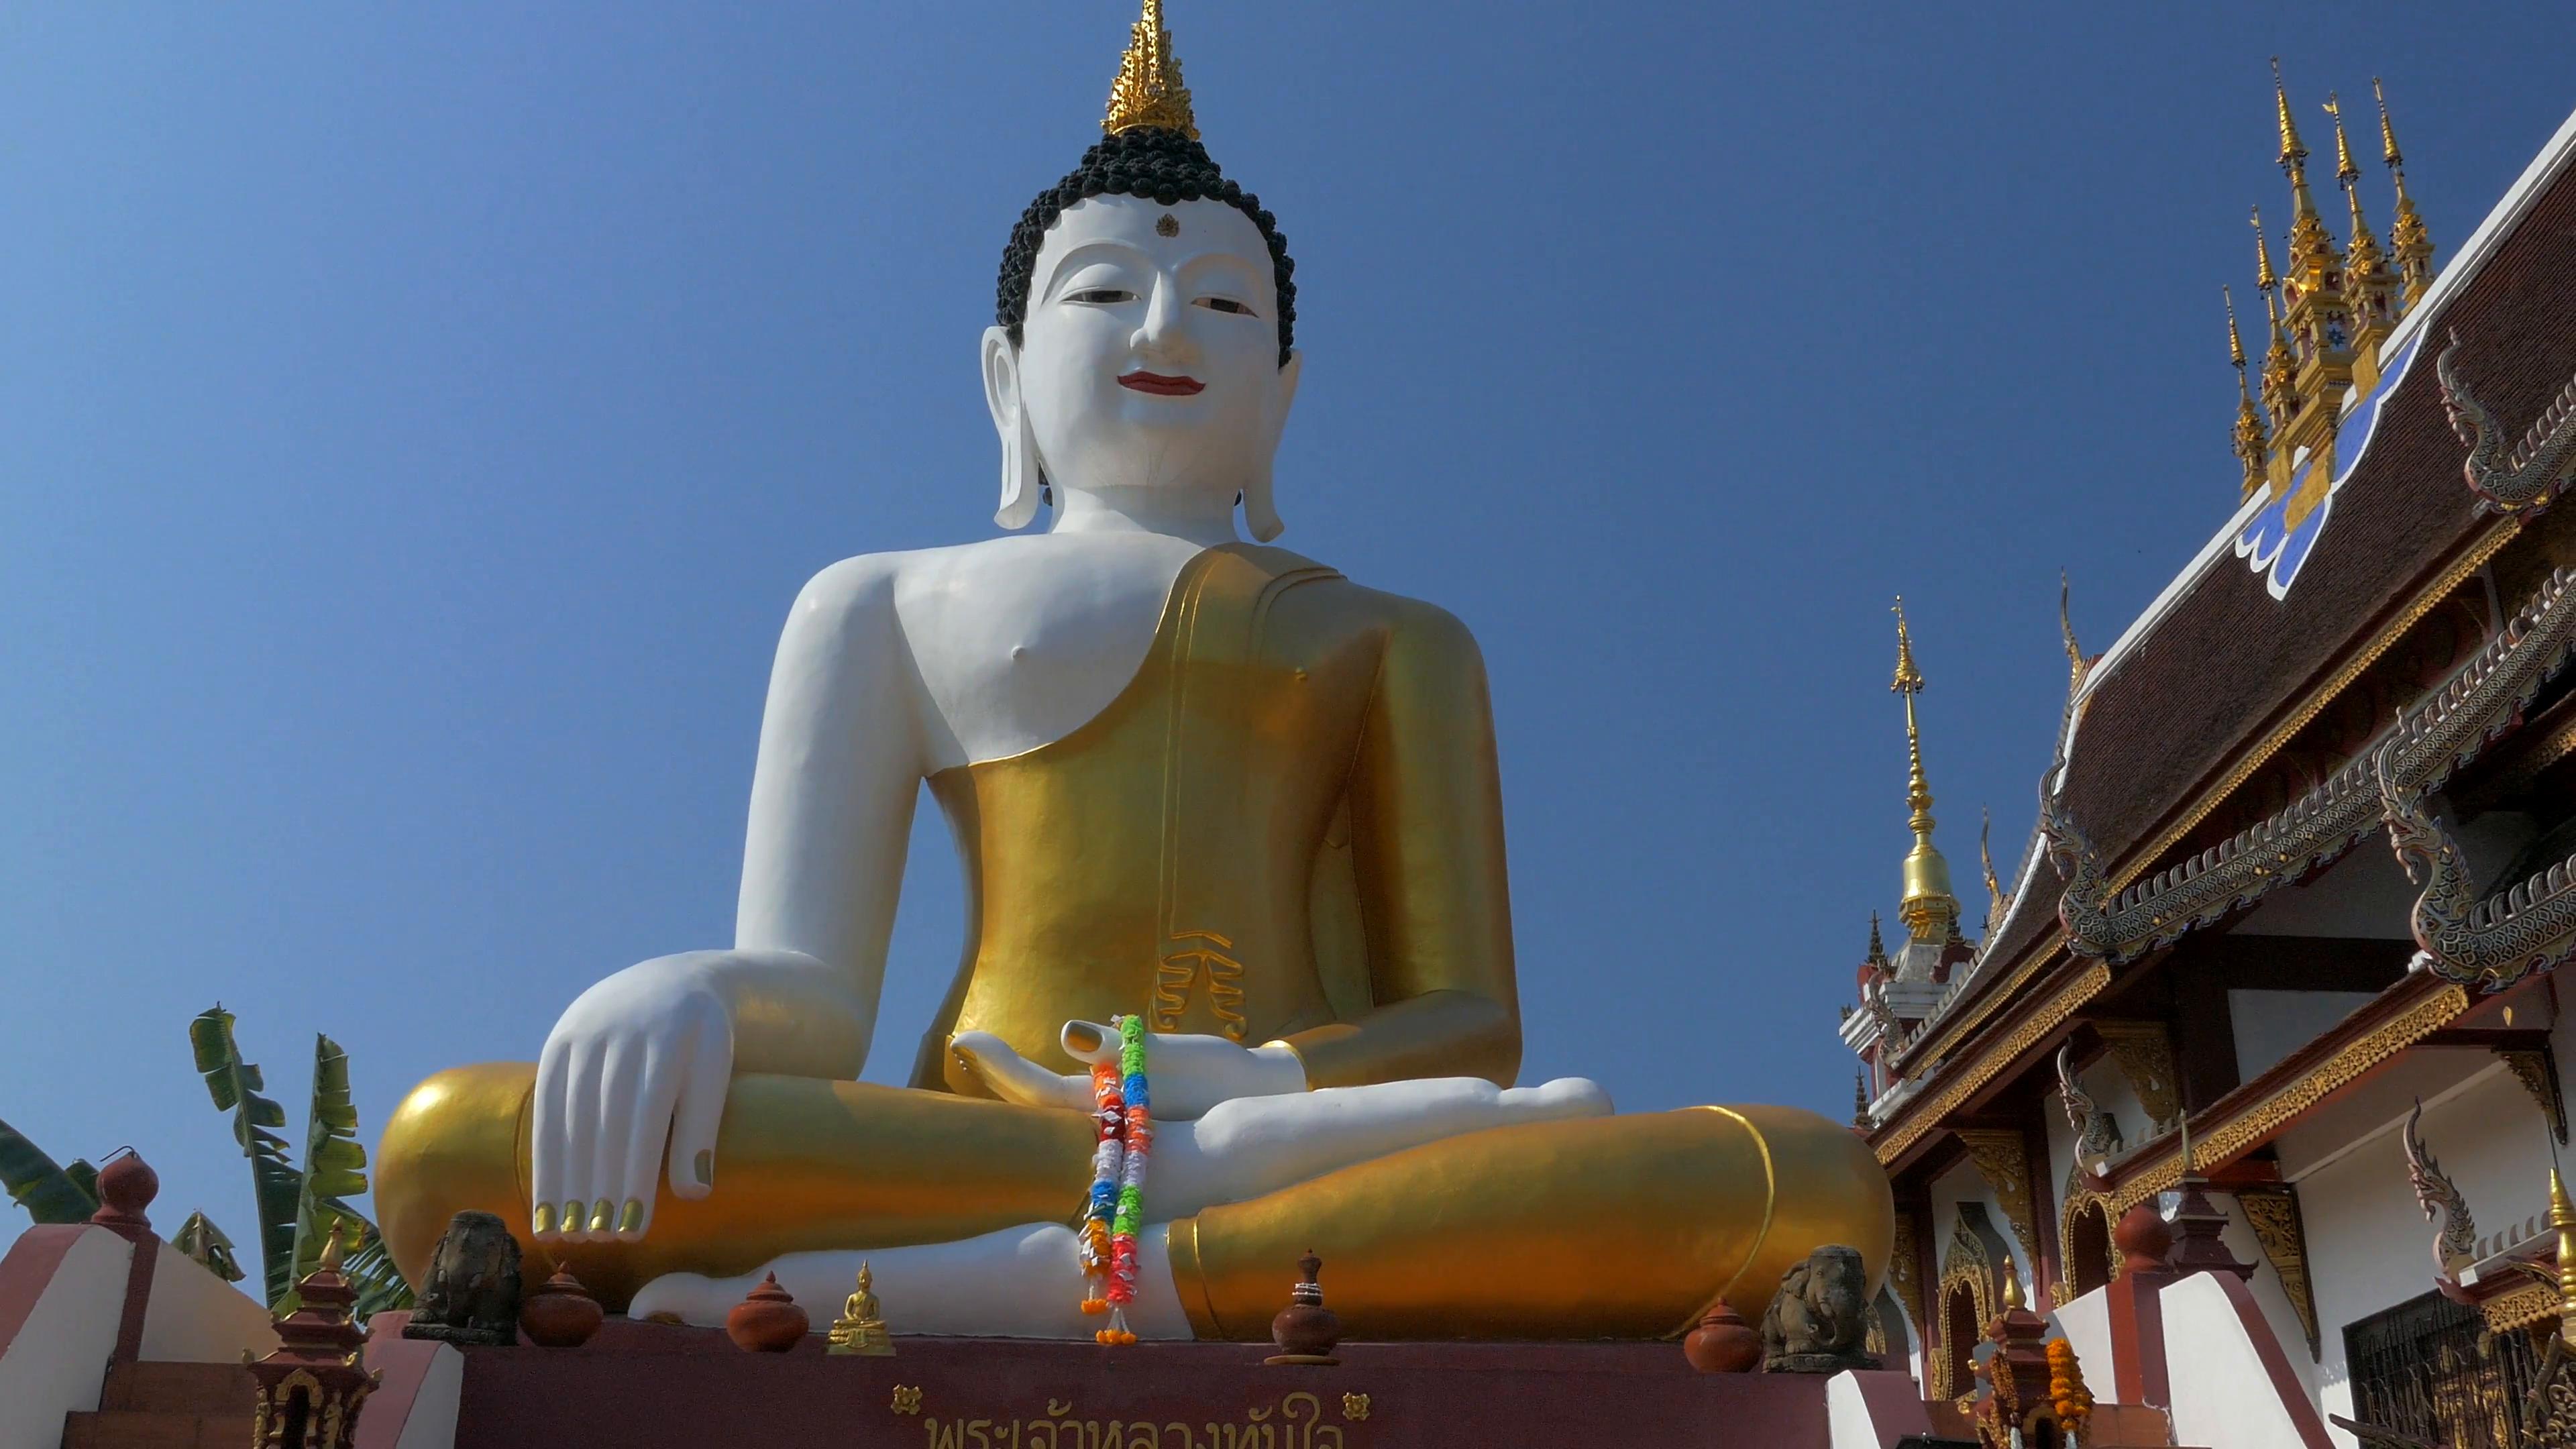 Big Golden Buddha statue in Chiang Mai, Thailand. Panning shot ...